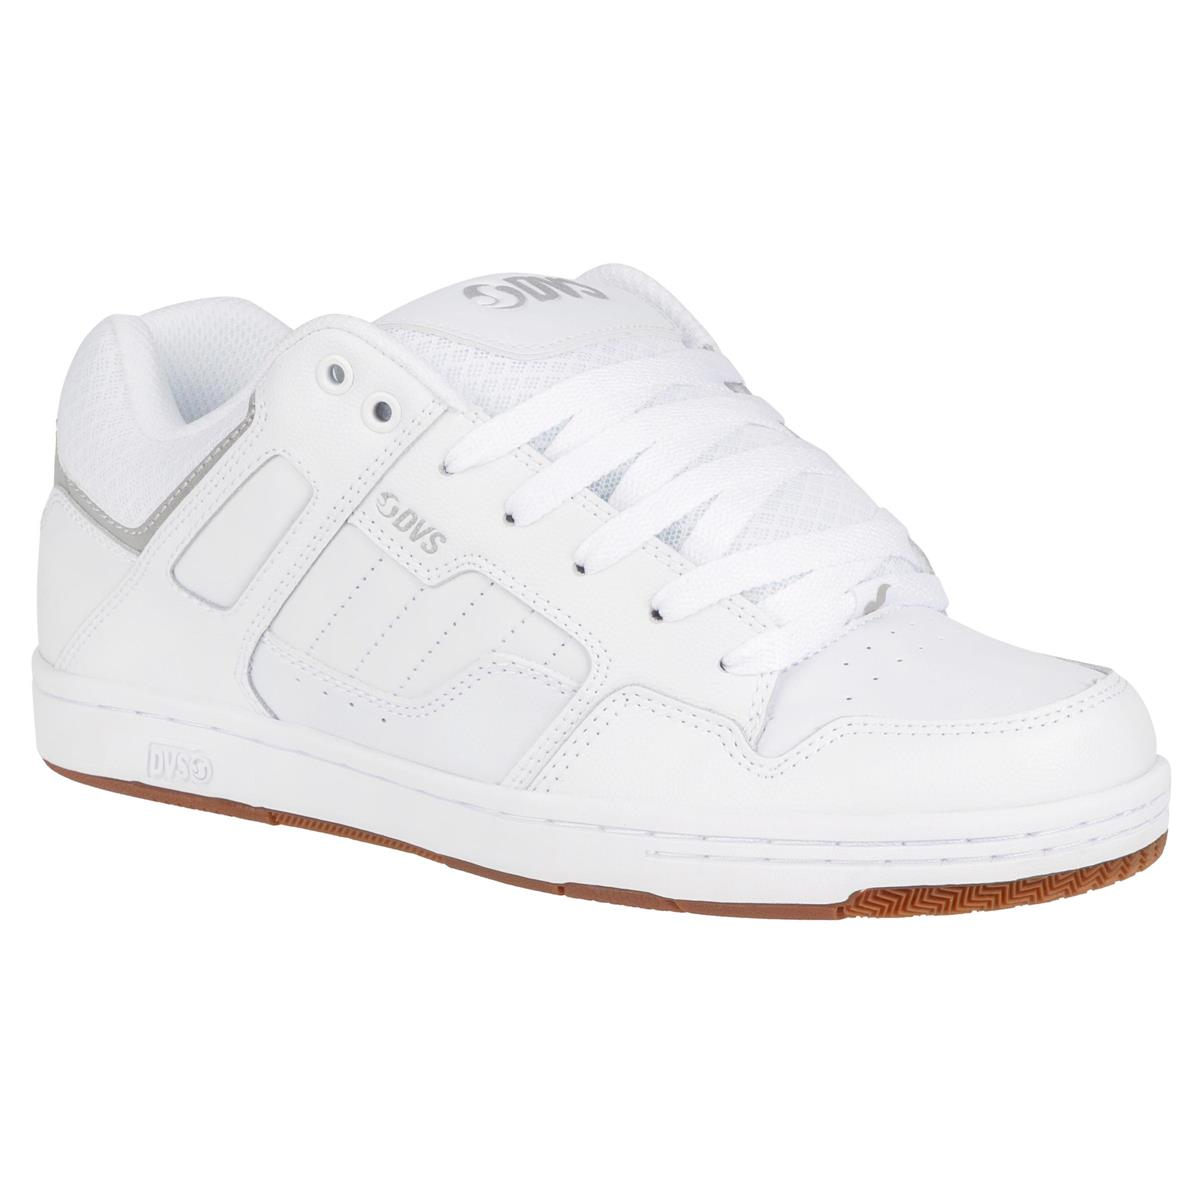 DVS Schuhe Enduro 125 Weiß Reflective Gum Nubuk